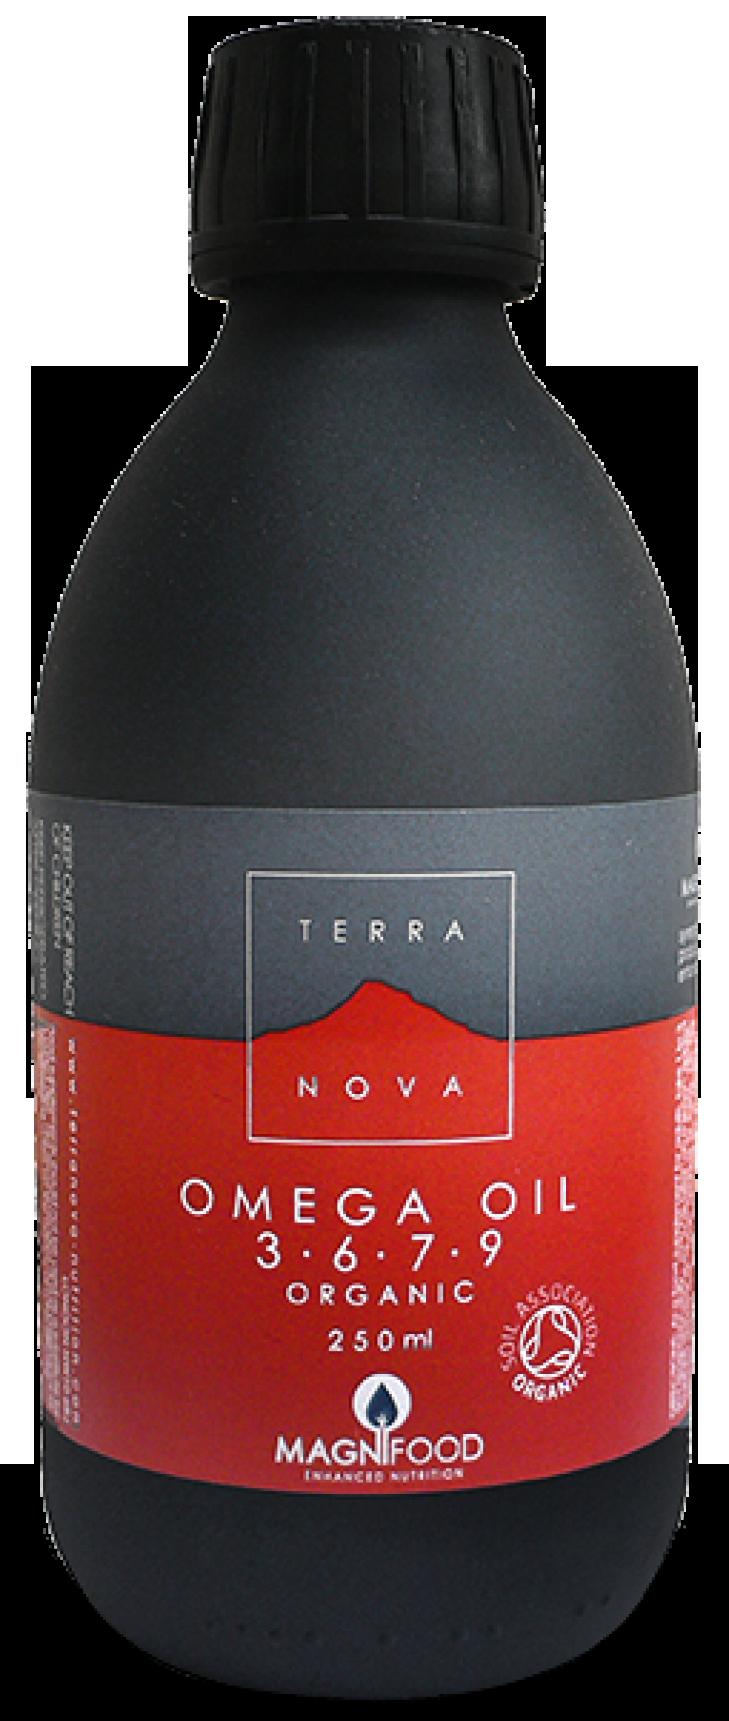 Terranova Omega Oil 3-6-7-9 Το Μόνο 100% Φυτικό, Βιολογικής Καλλιέργειας με Ω7, Χωρίς Ιχθυέλαια 50ml. Μάθετε περισσότερα ΕΔΩ: https://www.pharm24.gr/index.php?main_page=product_info&products_id=10791